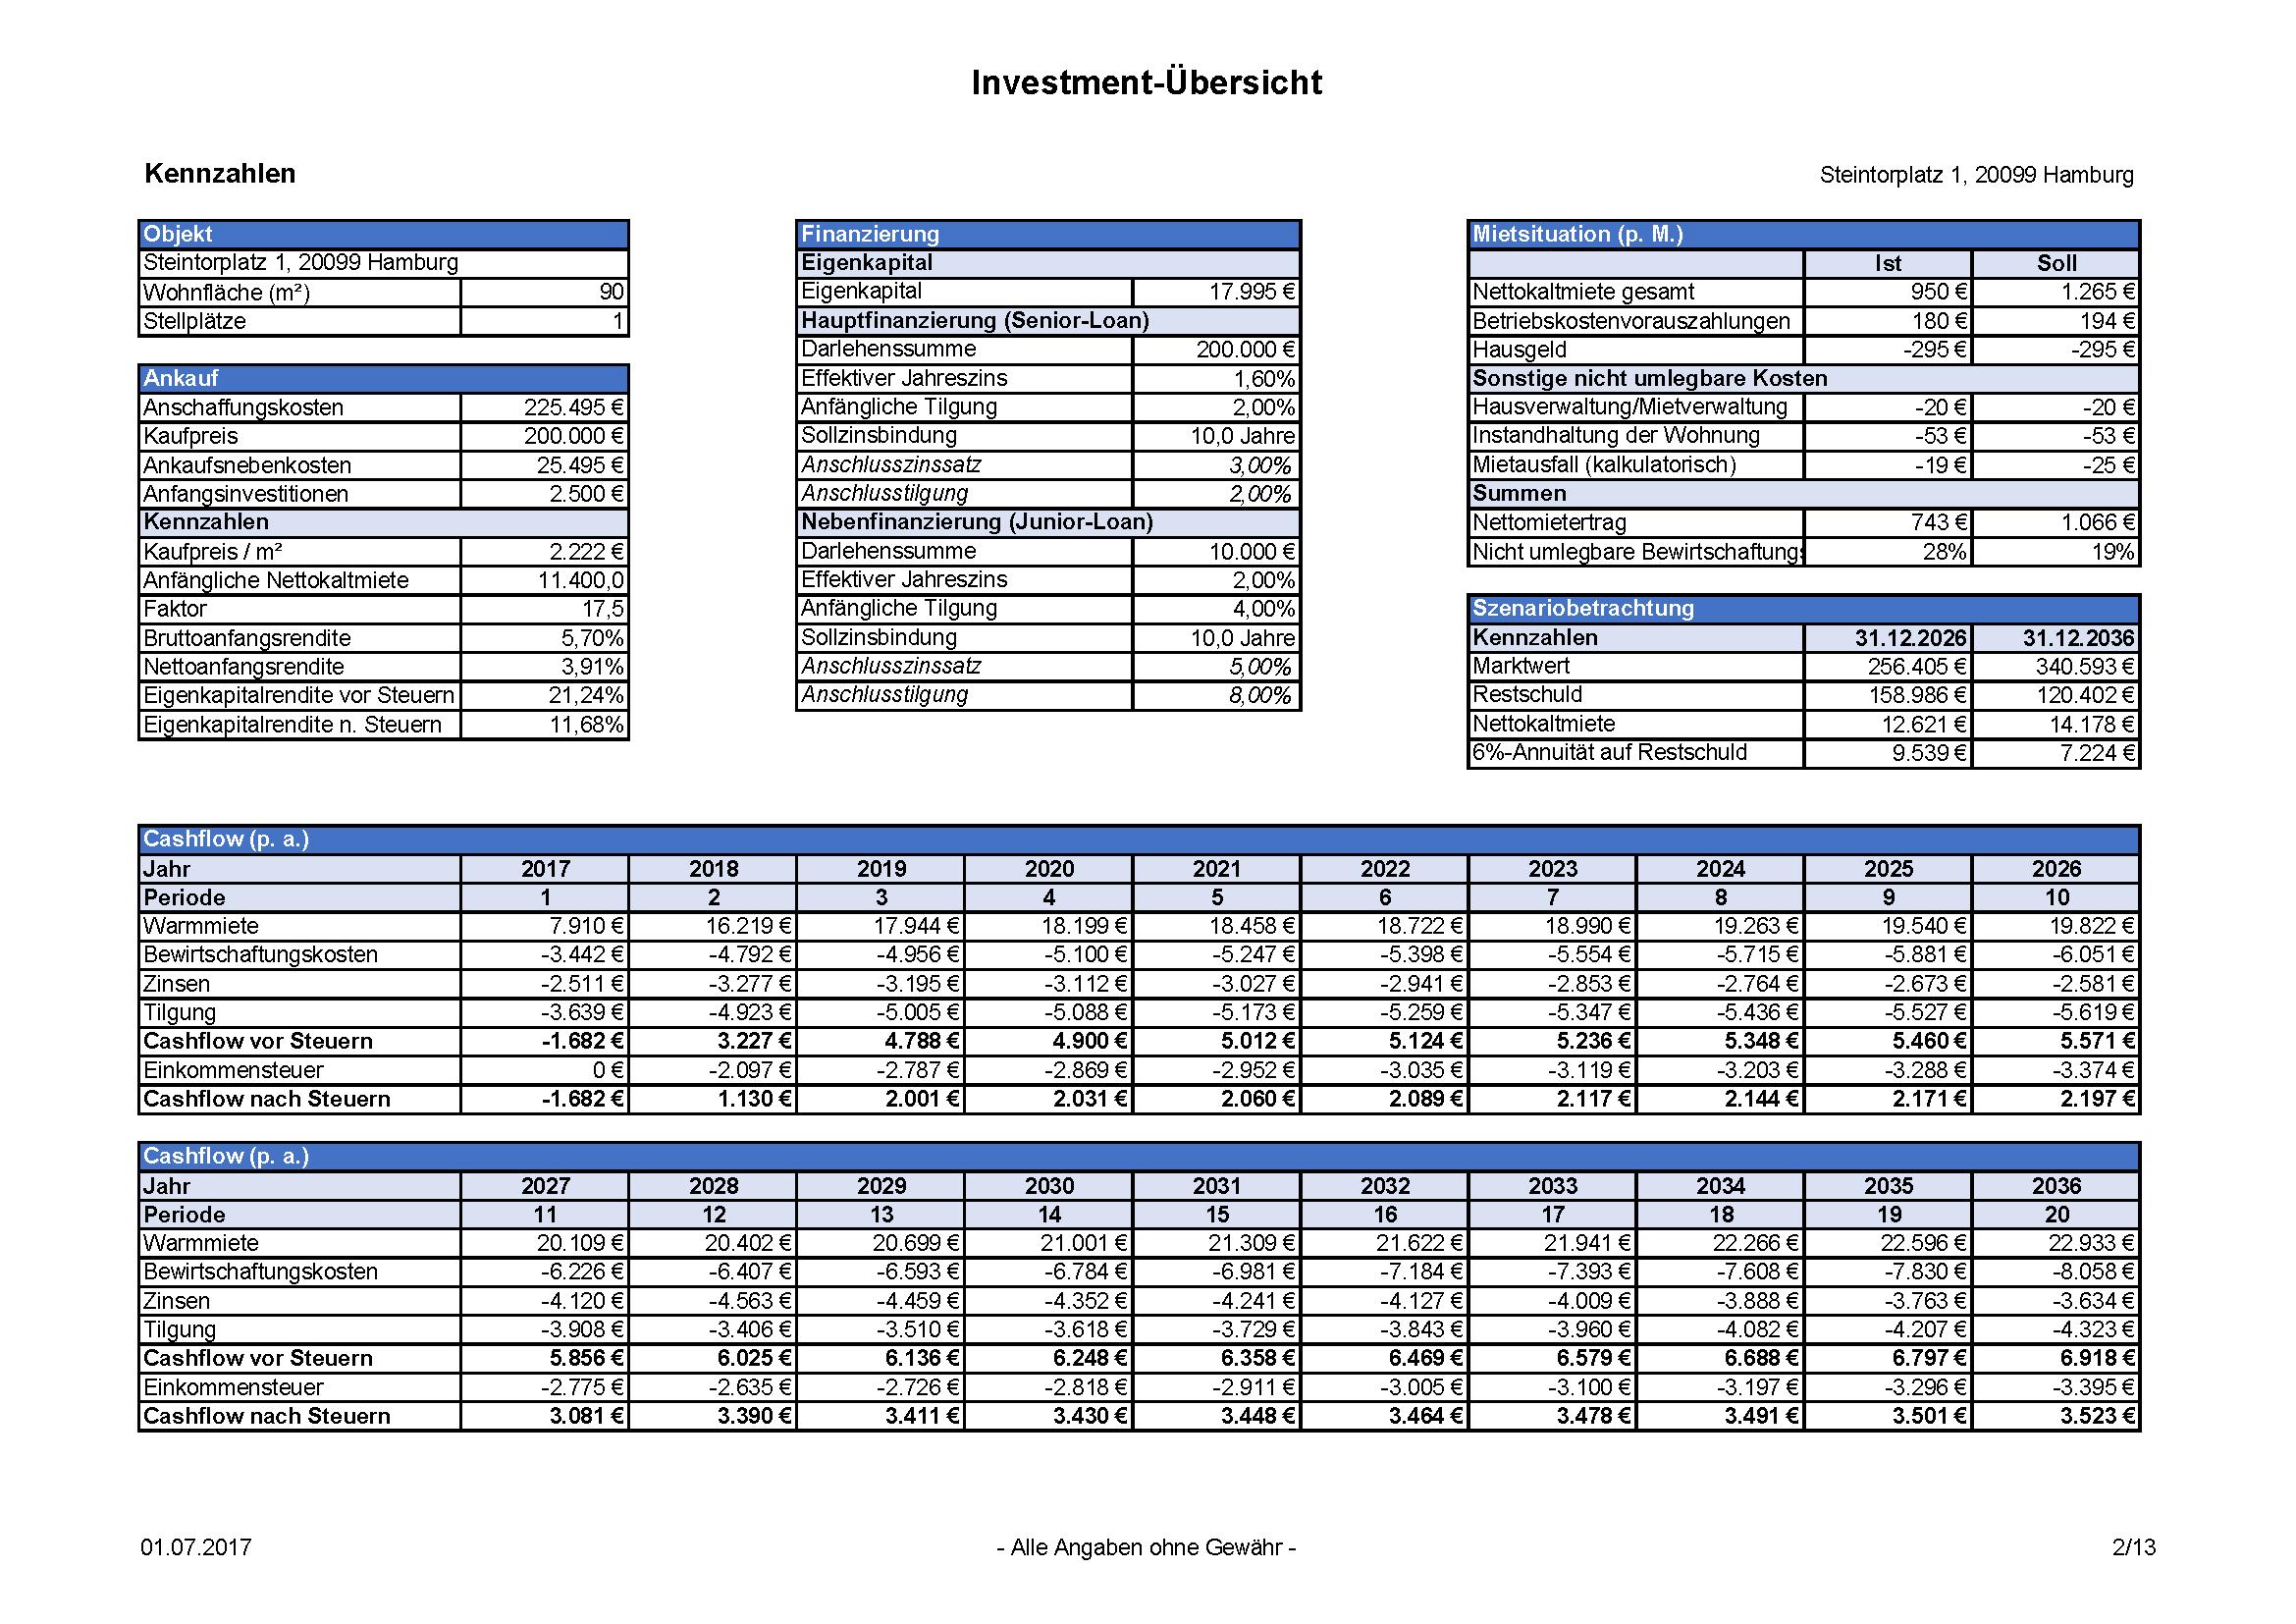 Investmentcockpit (Immobilien Investment Rechner)